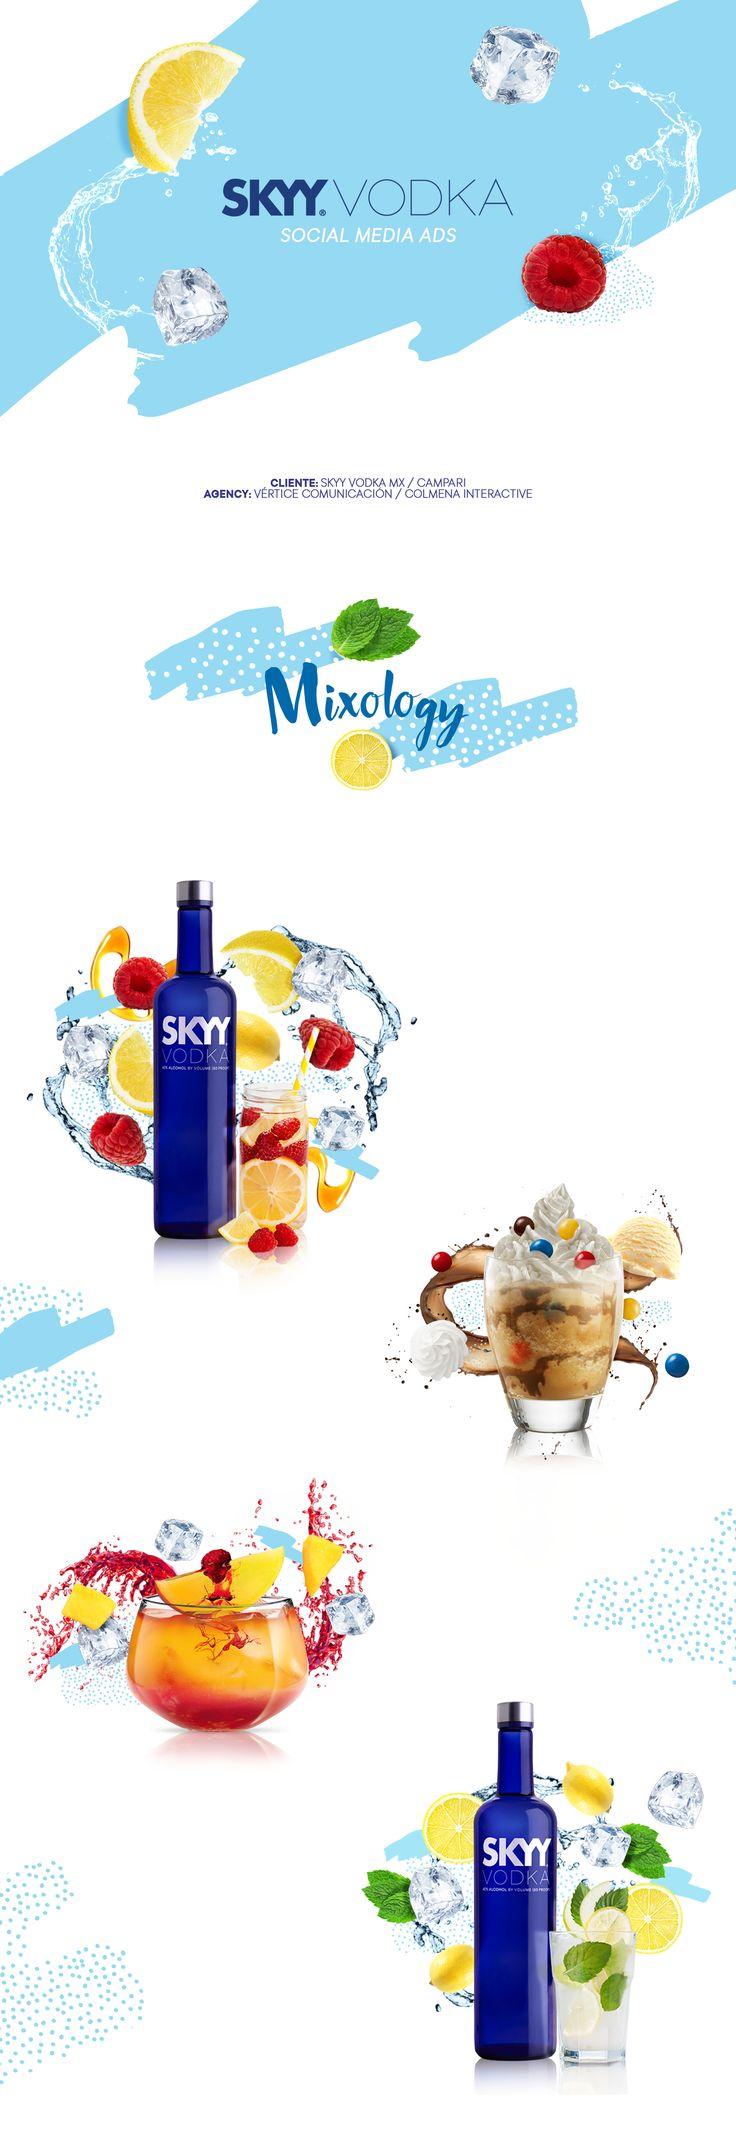 "Consulta este proyecto @Behance: ""SKYY Vodka México: Mixology / Social Media Ads"" https://www.behance.net/gallery/45251157/SKYY-Vodka-Mxico-Mixology-Social-Media-Ads"